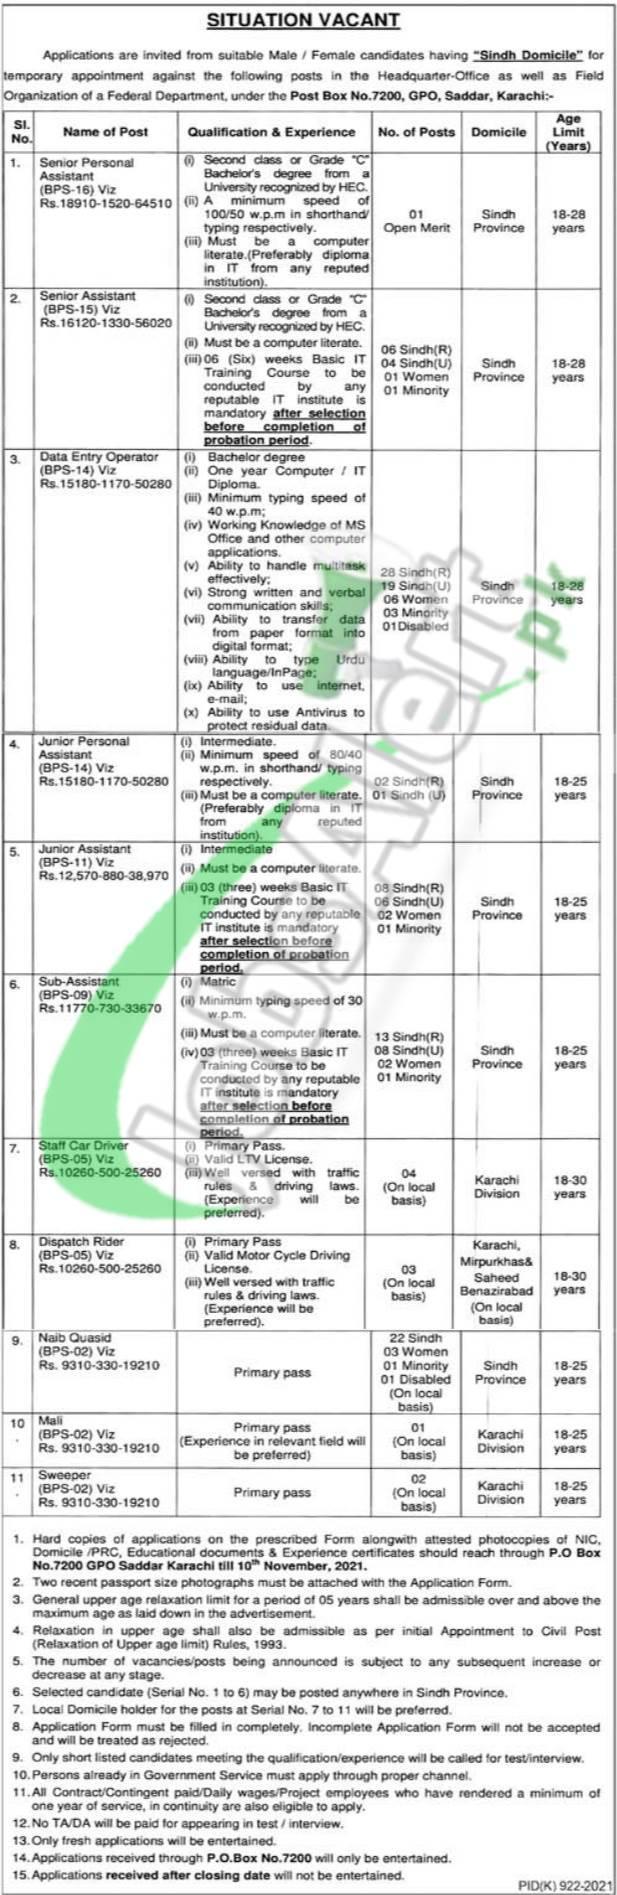 PO Box 7200 Karachi Jobs 2021 Application Form Download Online